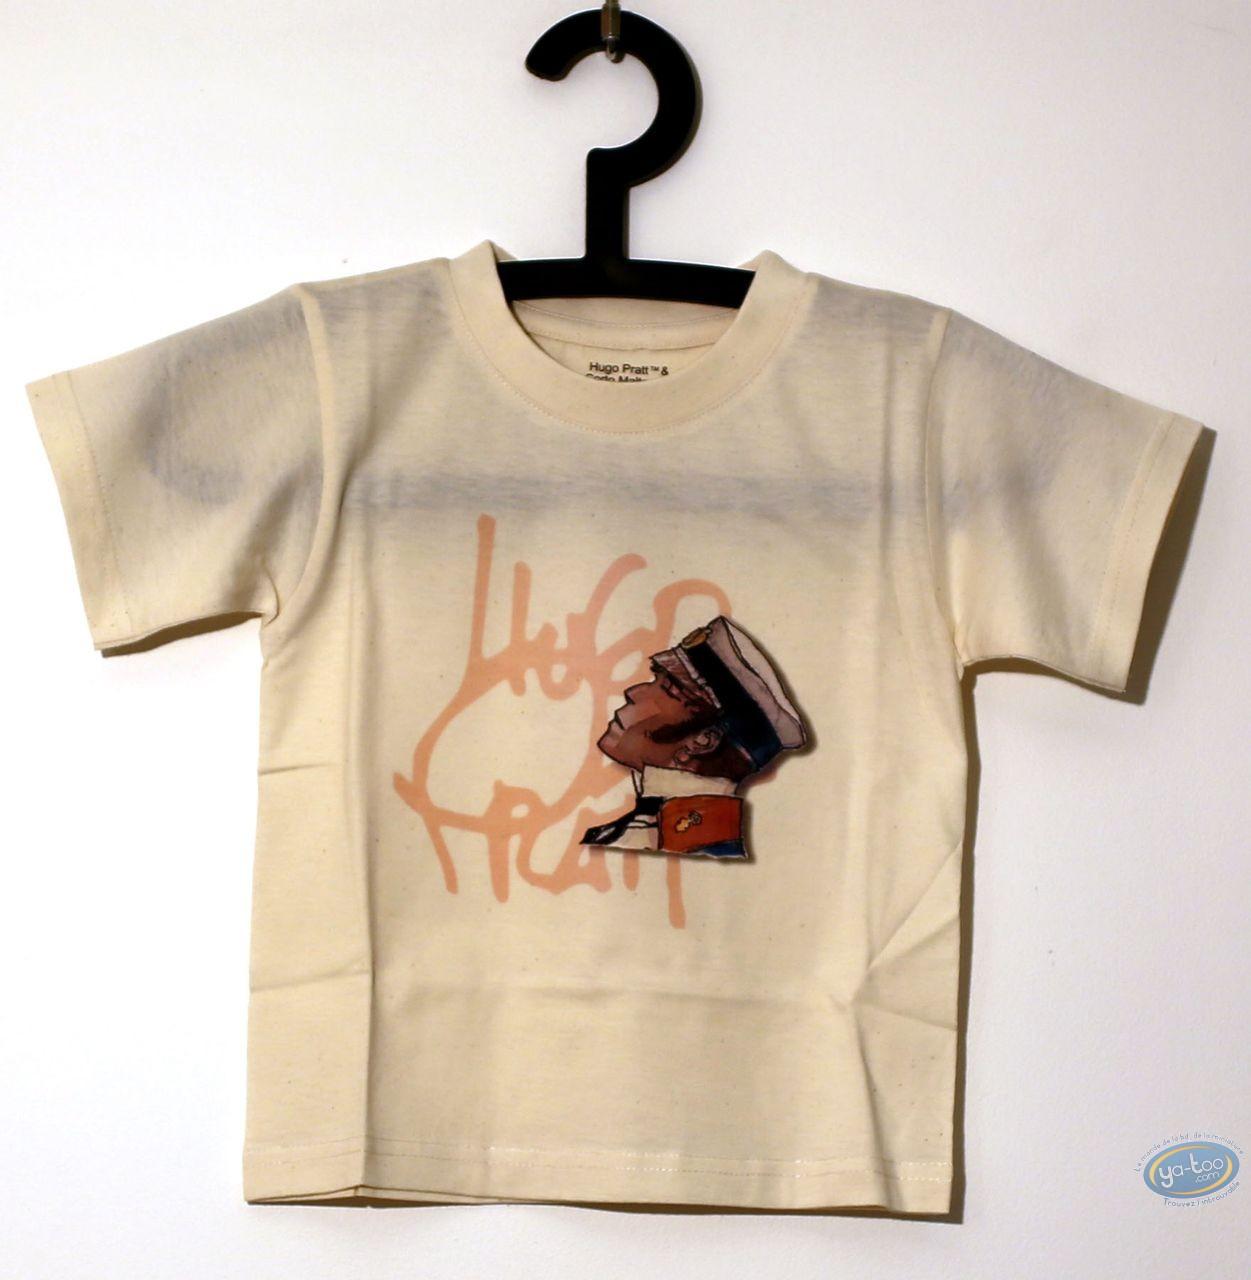 Vêtement, Corto Maltese : T-shirt, Kid 02/02 - 7/8 ans